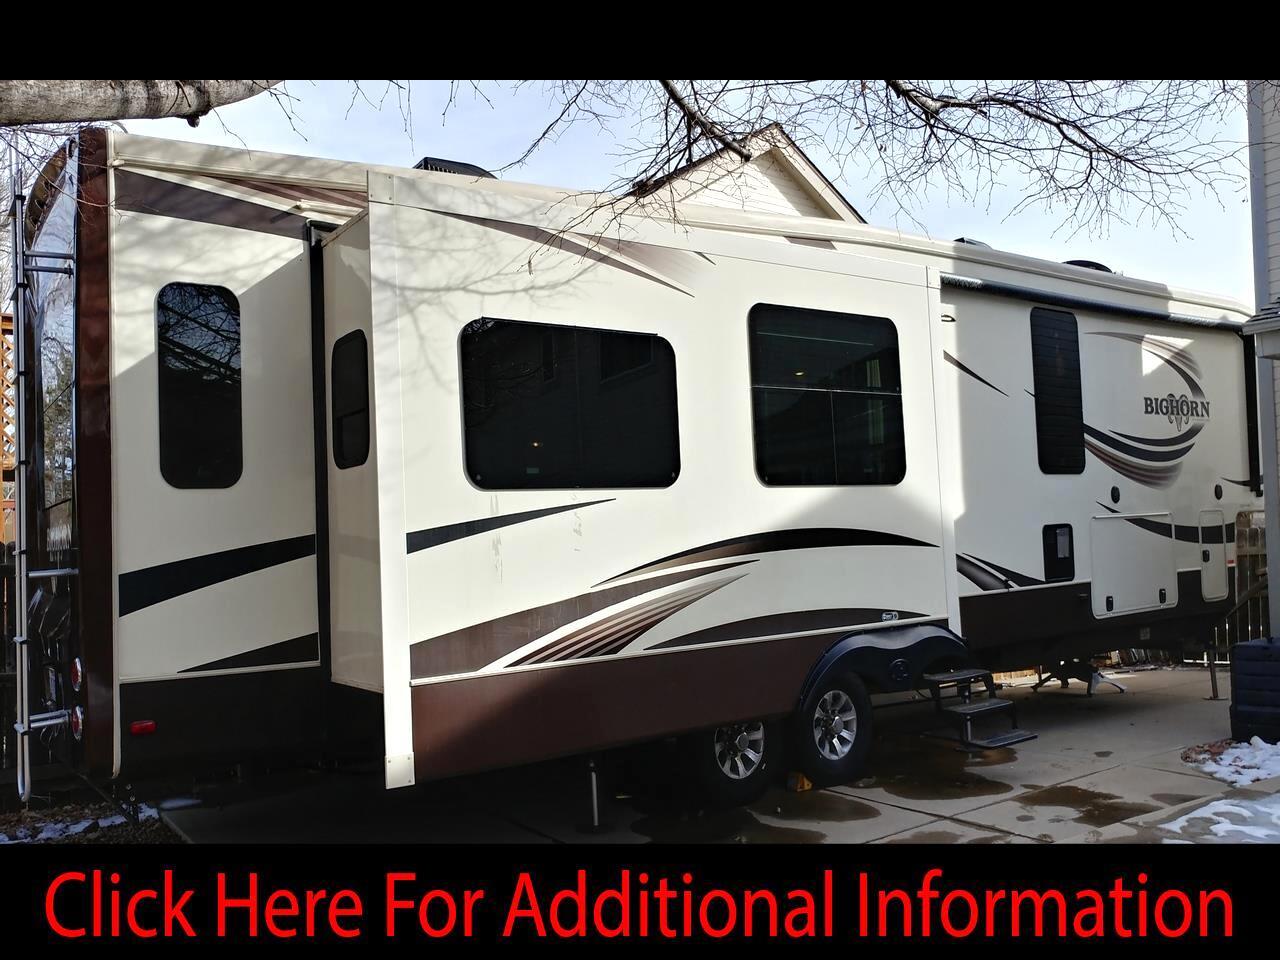 2015 Heartland Bighorn 3875FB 5th Wheel